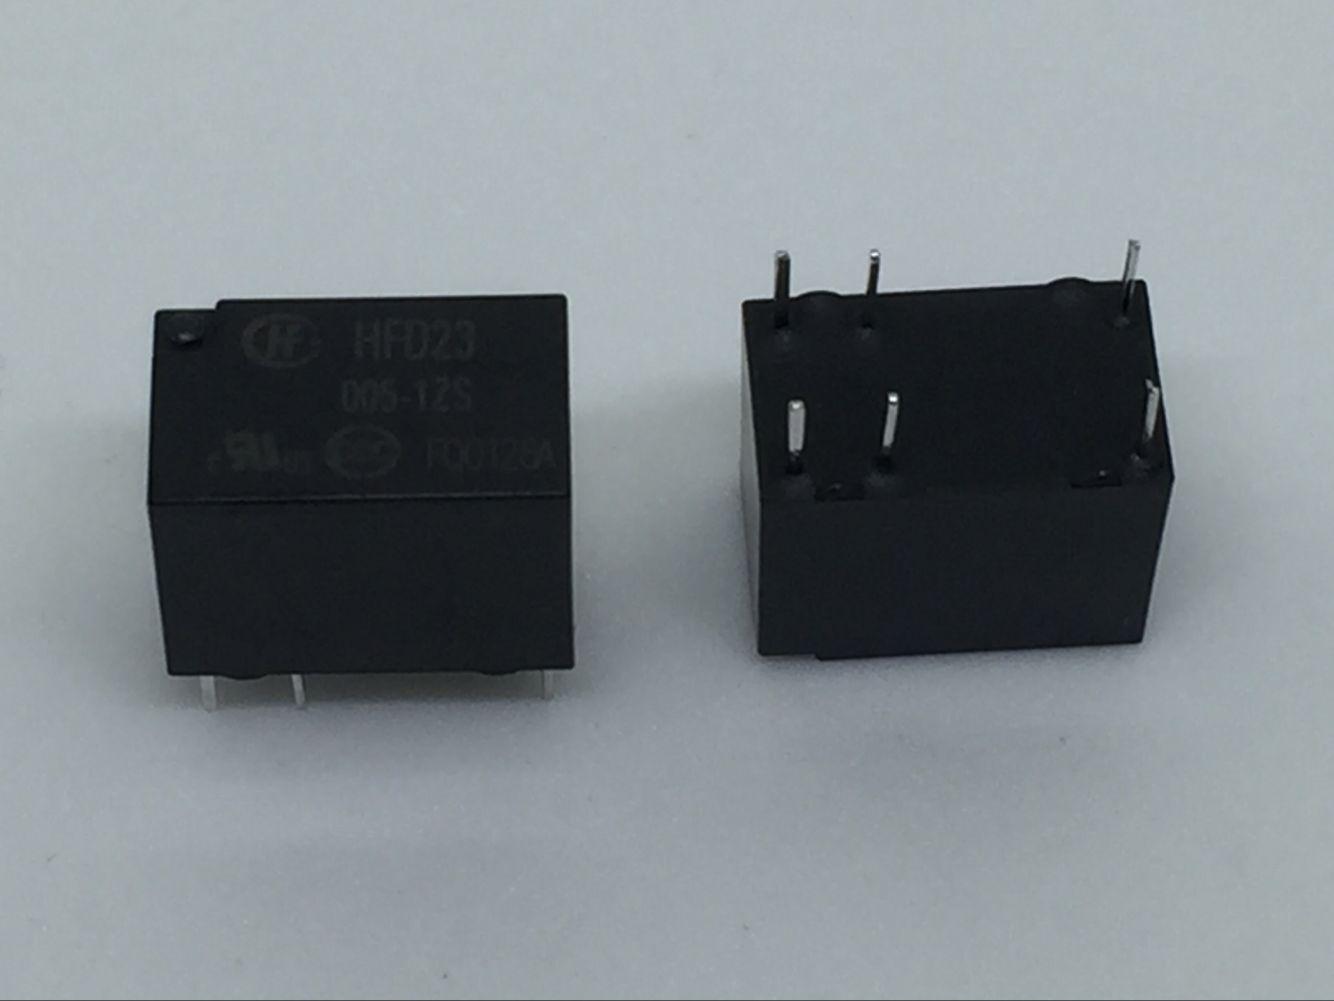 Free Shipping 100% new original relay 10pcs/lot  JRC-23F-005-1ZS JRC-23F 005-1ZS HFD23-005-1ZS Can replace G5V-1-DC5V HRB1